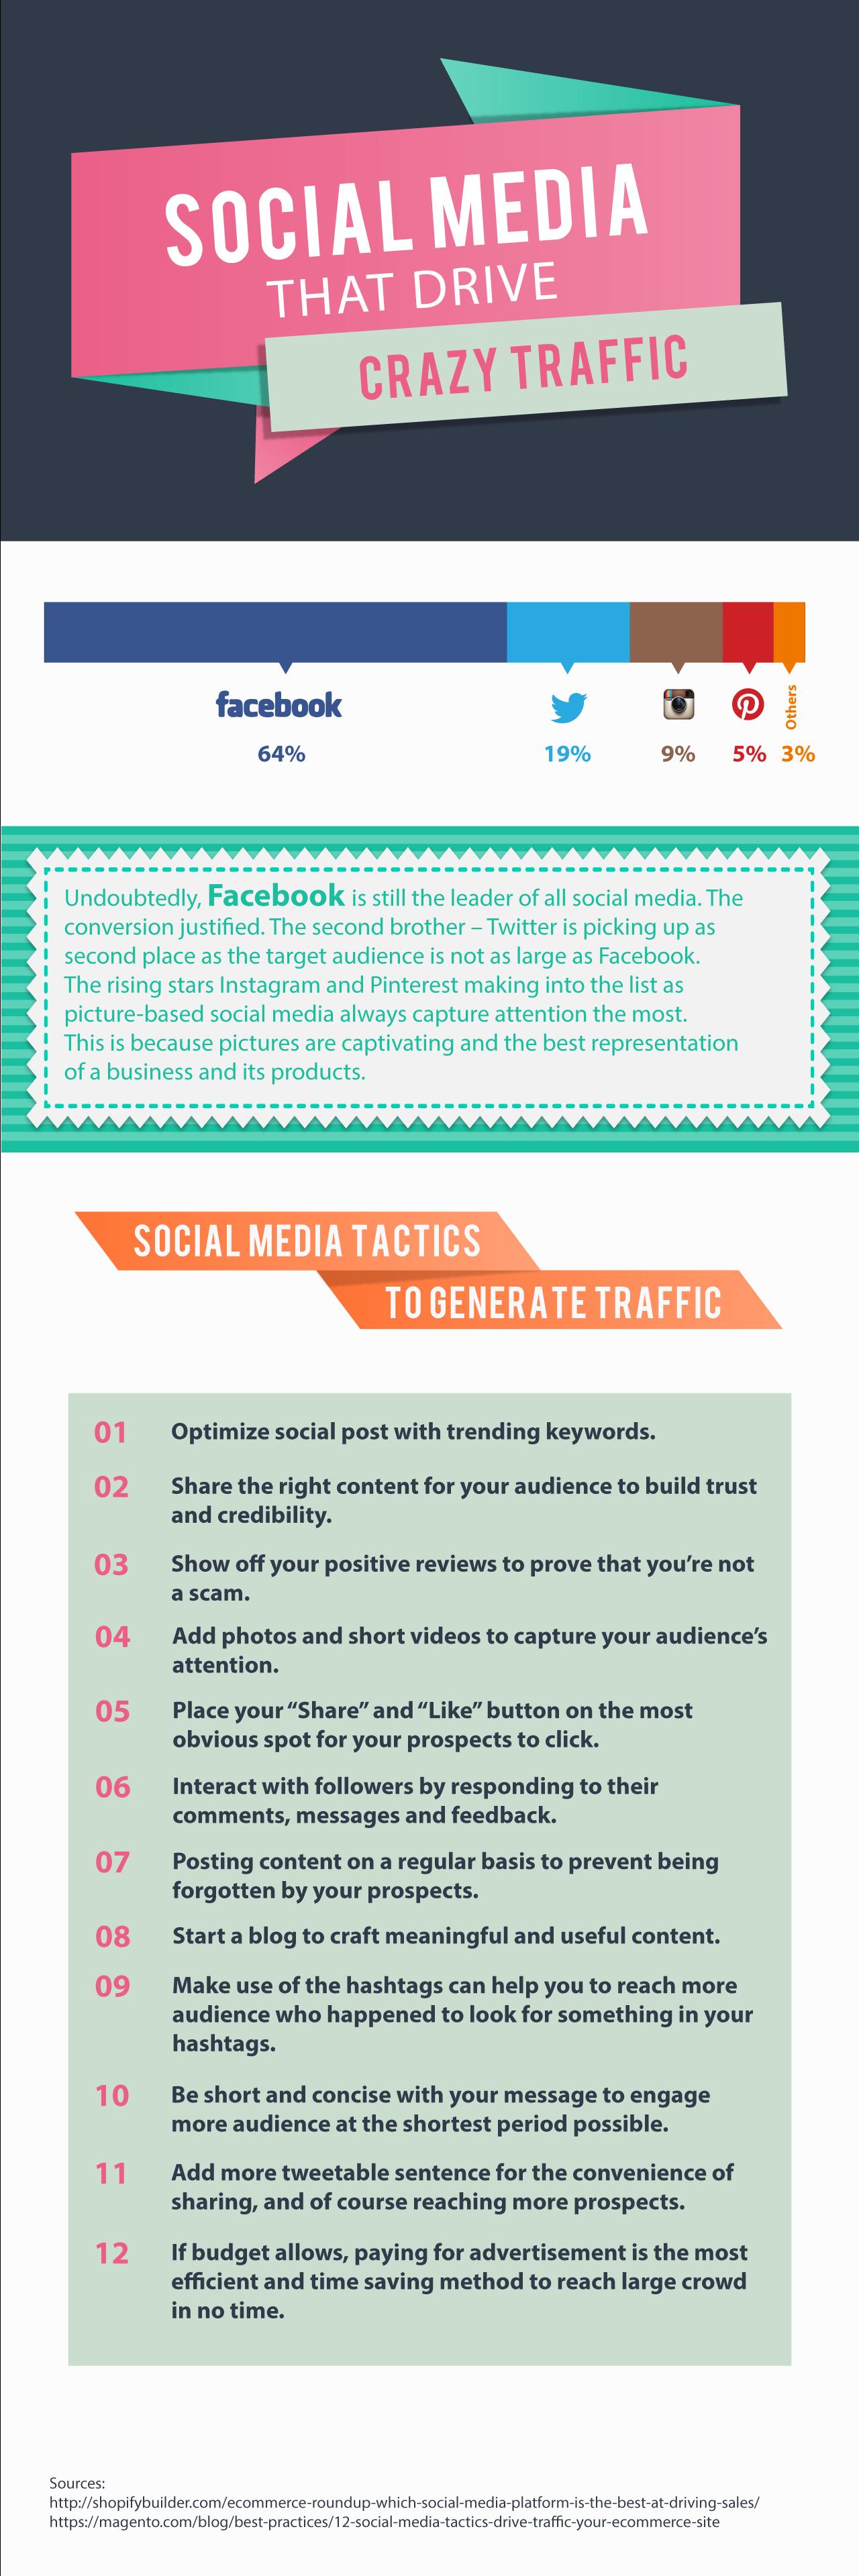 social-media-that-drive-crazy-traffic